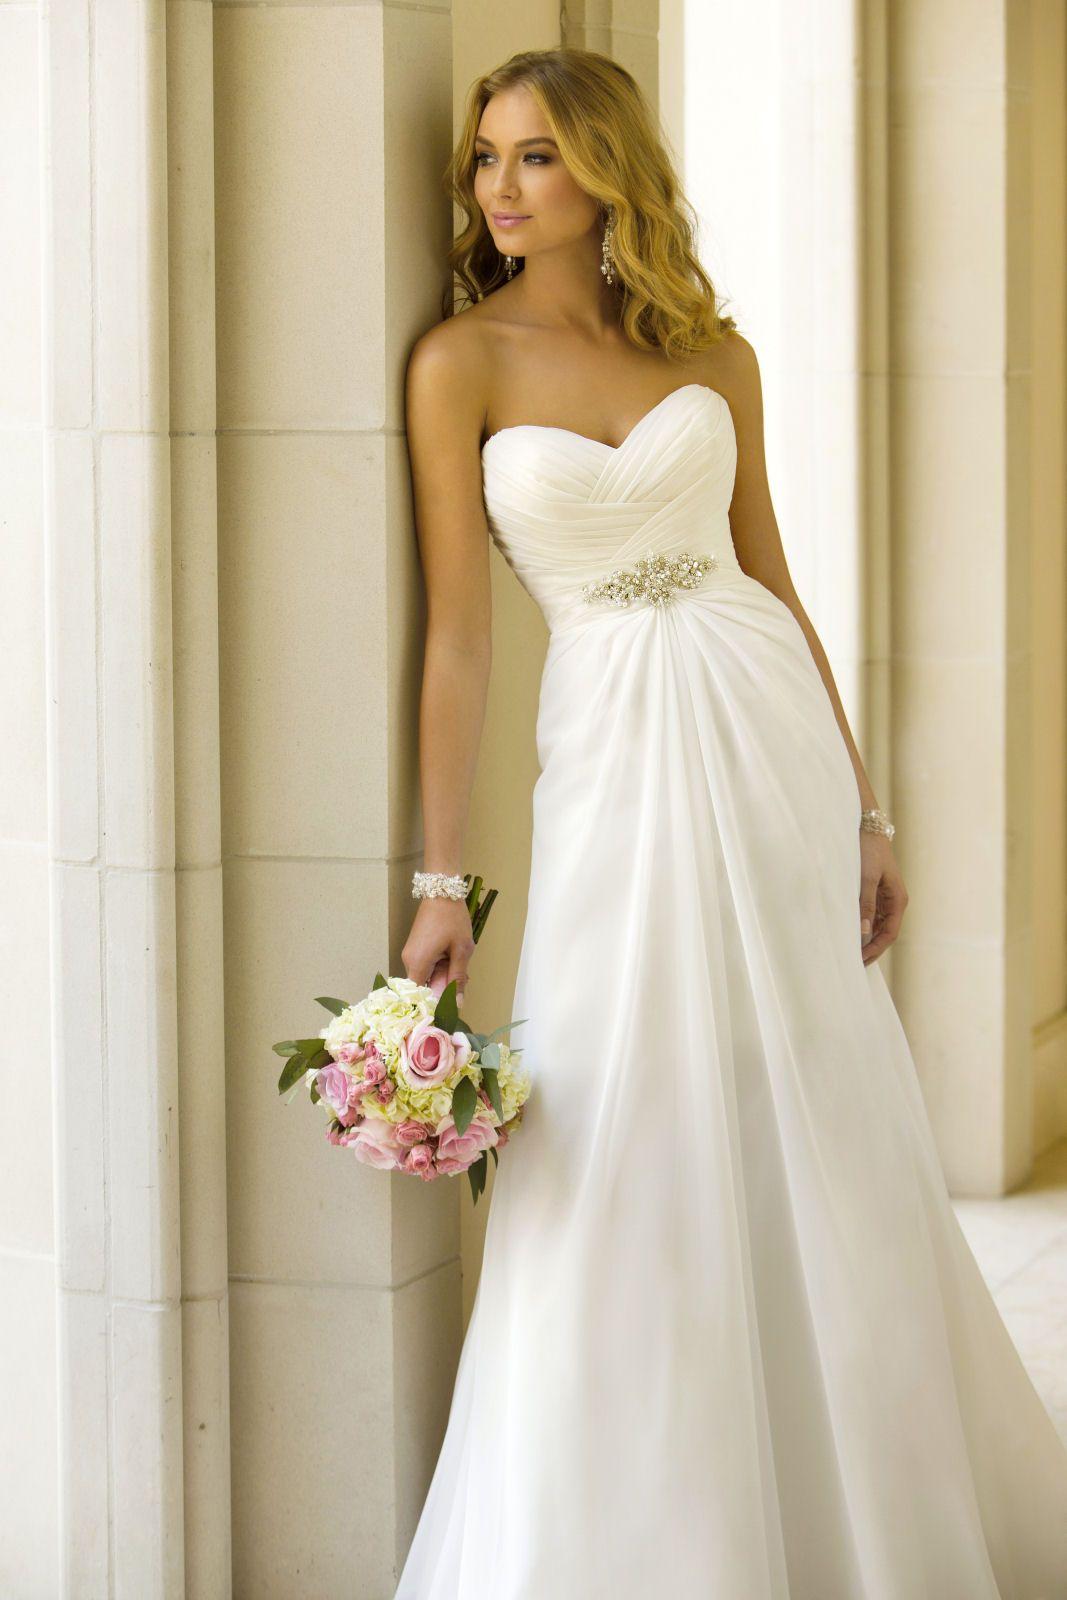 Nice dresses for wedding   from Stella York via hitched Bridalwear  val wedding